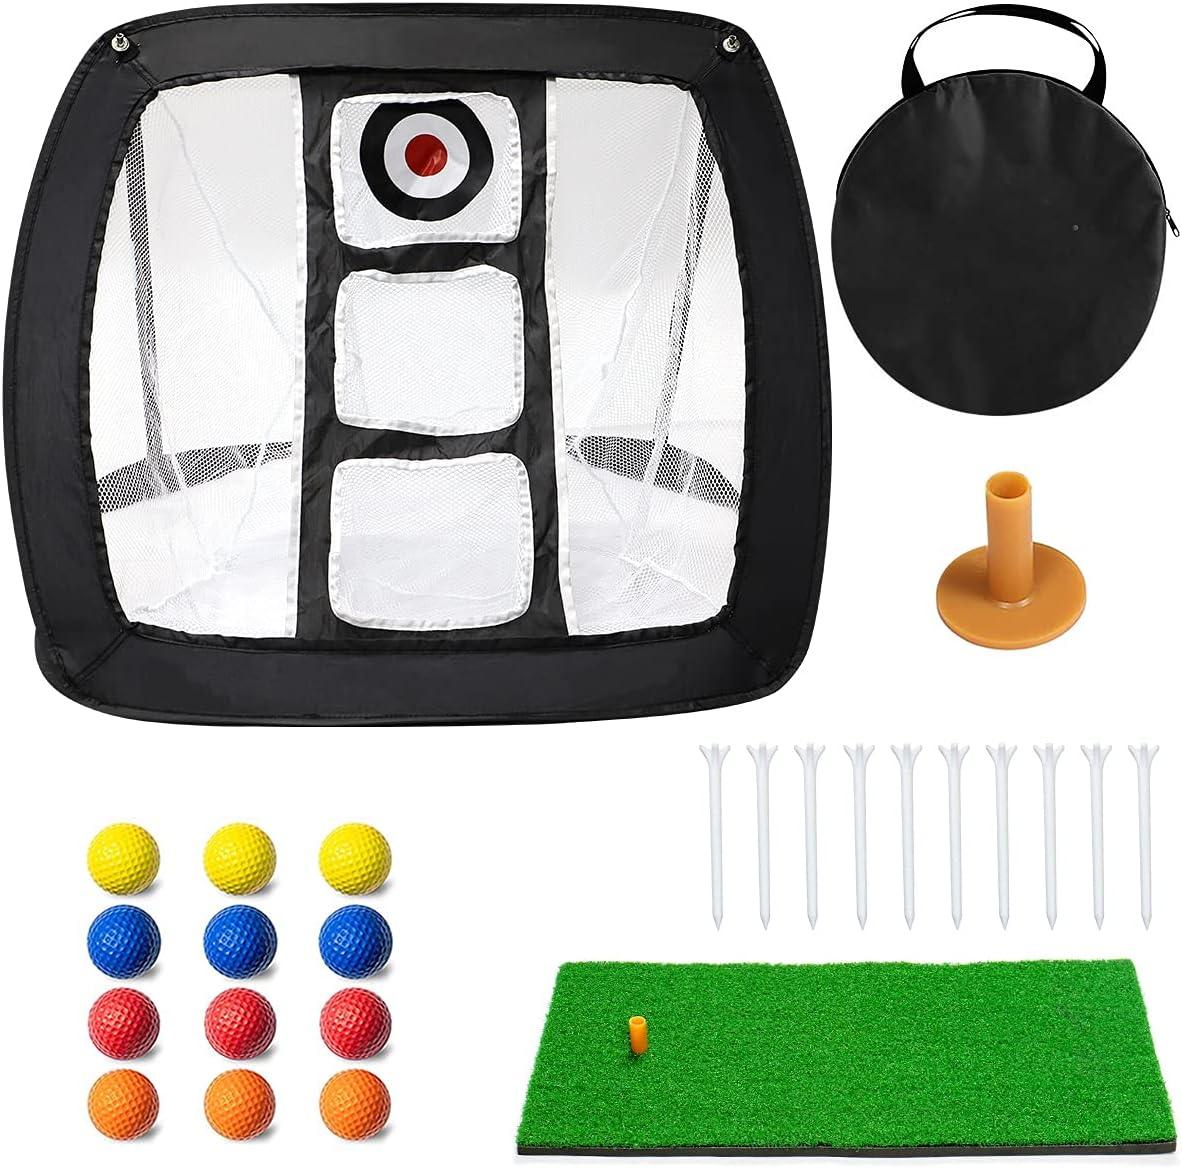 Save money Golf Chipping Net Indoor Target Golfing Outdoor Accessories Cheap sale